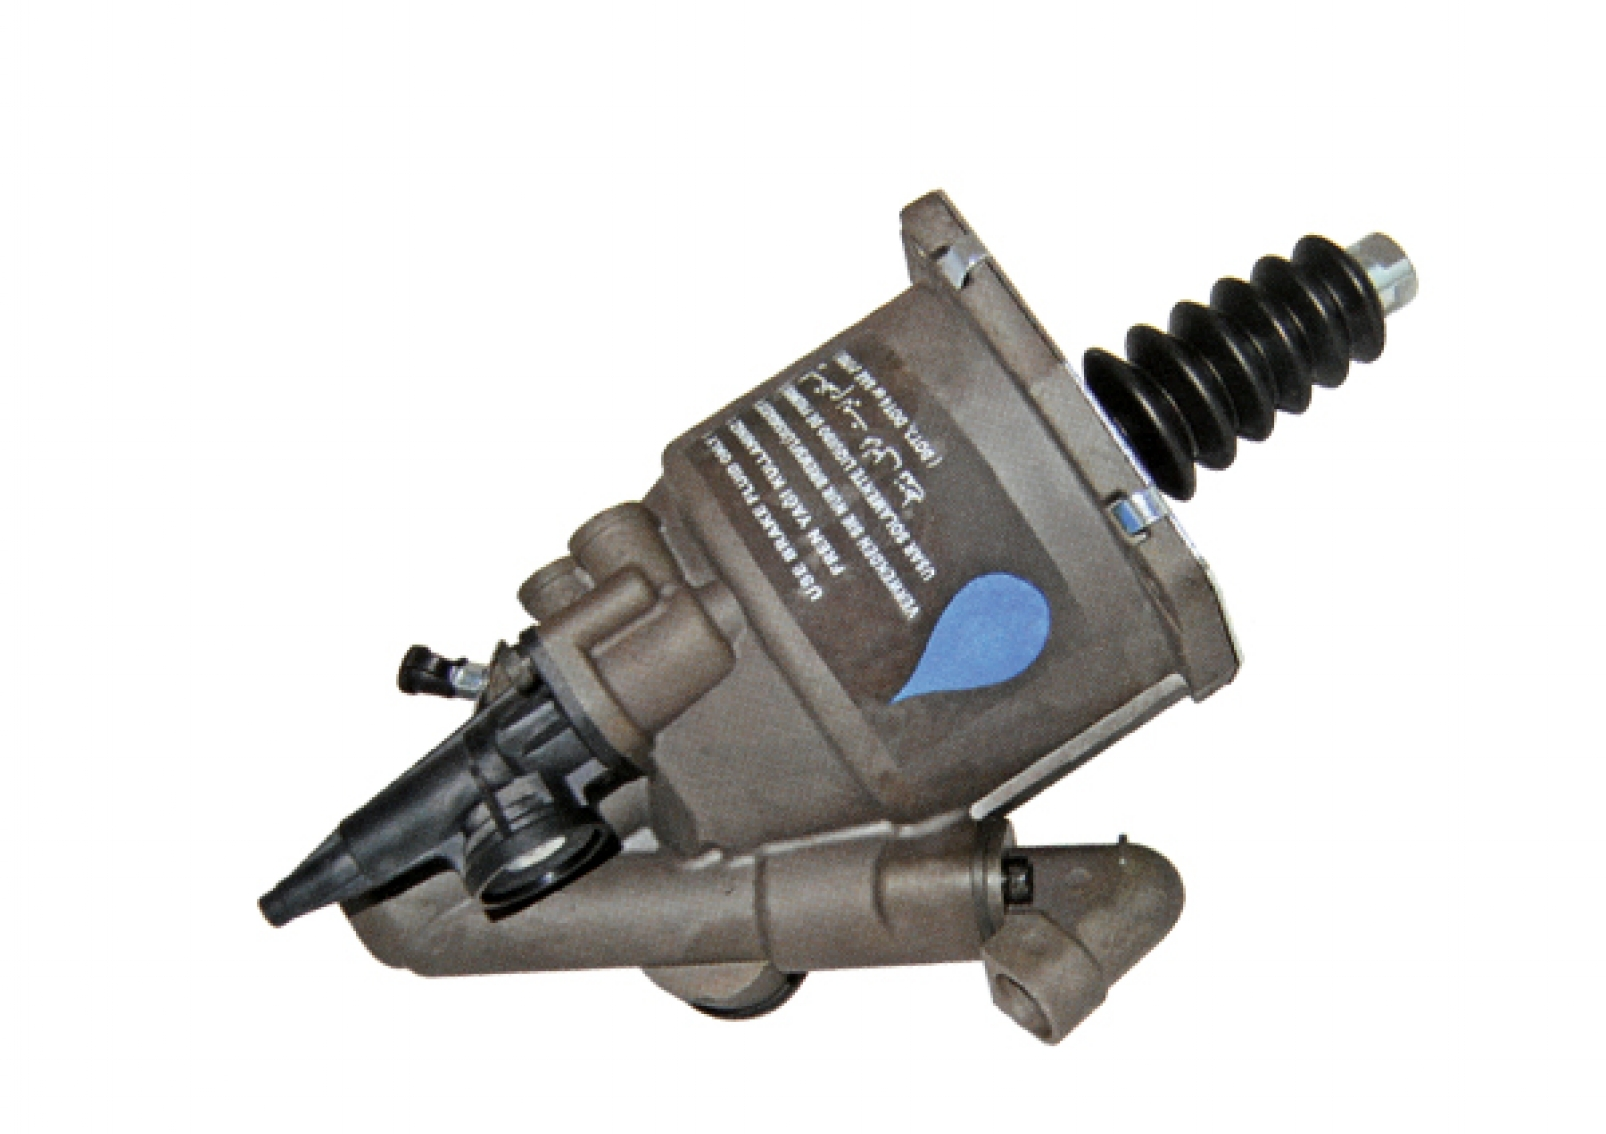 Clutch Servo Repair Kit for Man, Volvo, Renault, 629300AM, 5010545581, 5001866284